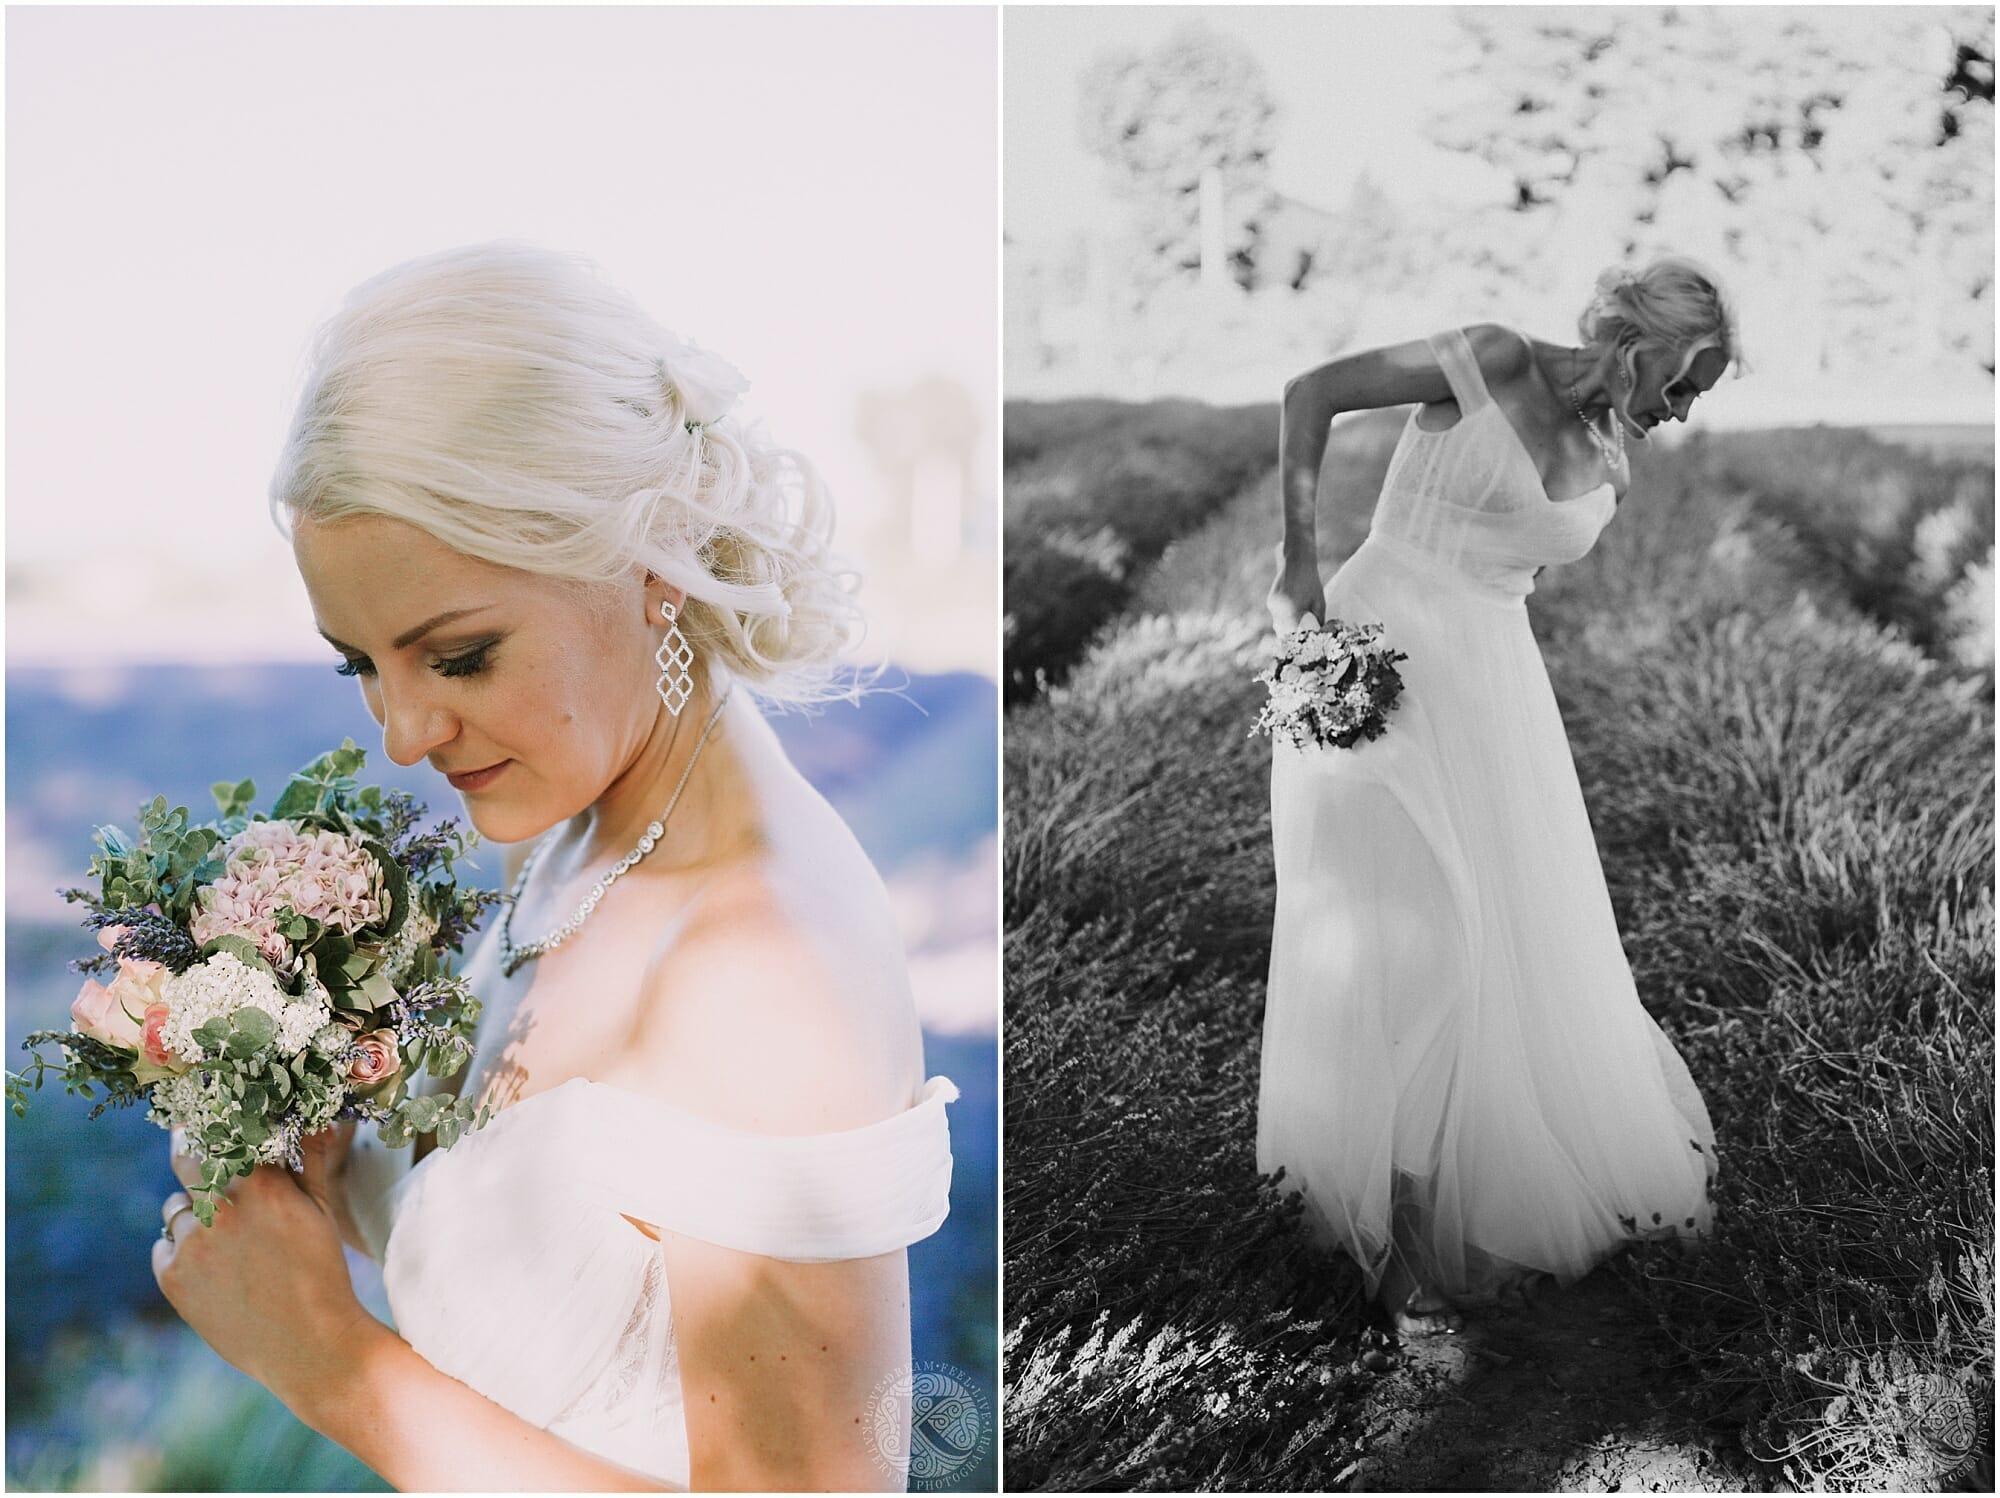 Kateryna-photos-photographe-mariage-chateau-des-3-fontaines-provence-avignon-vaucluse-sud_0093.jpg